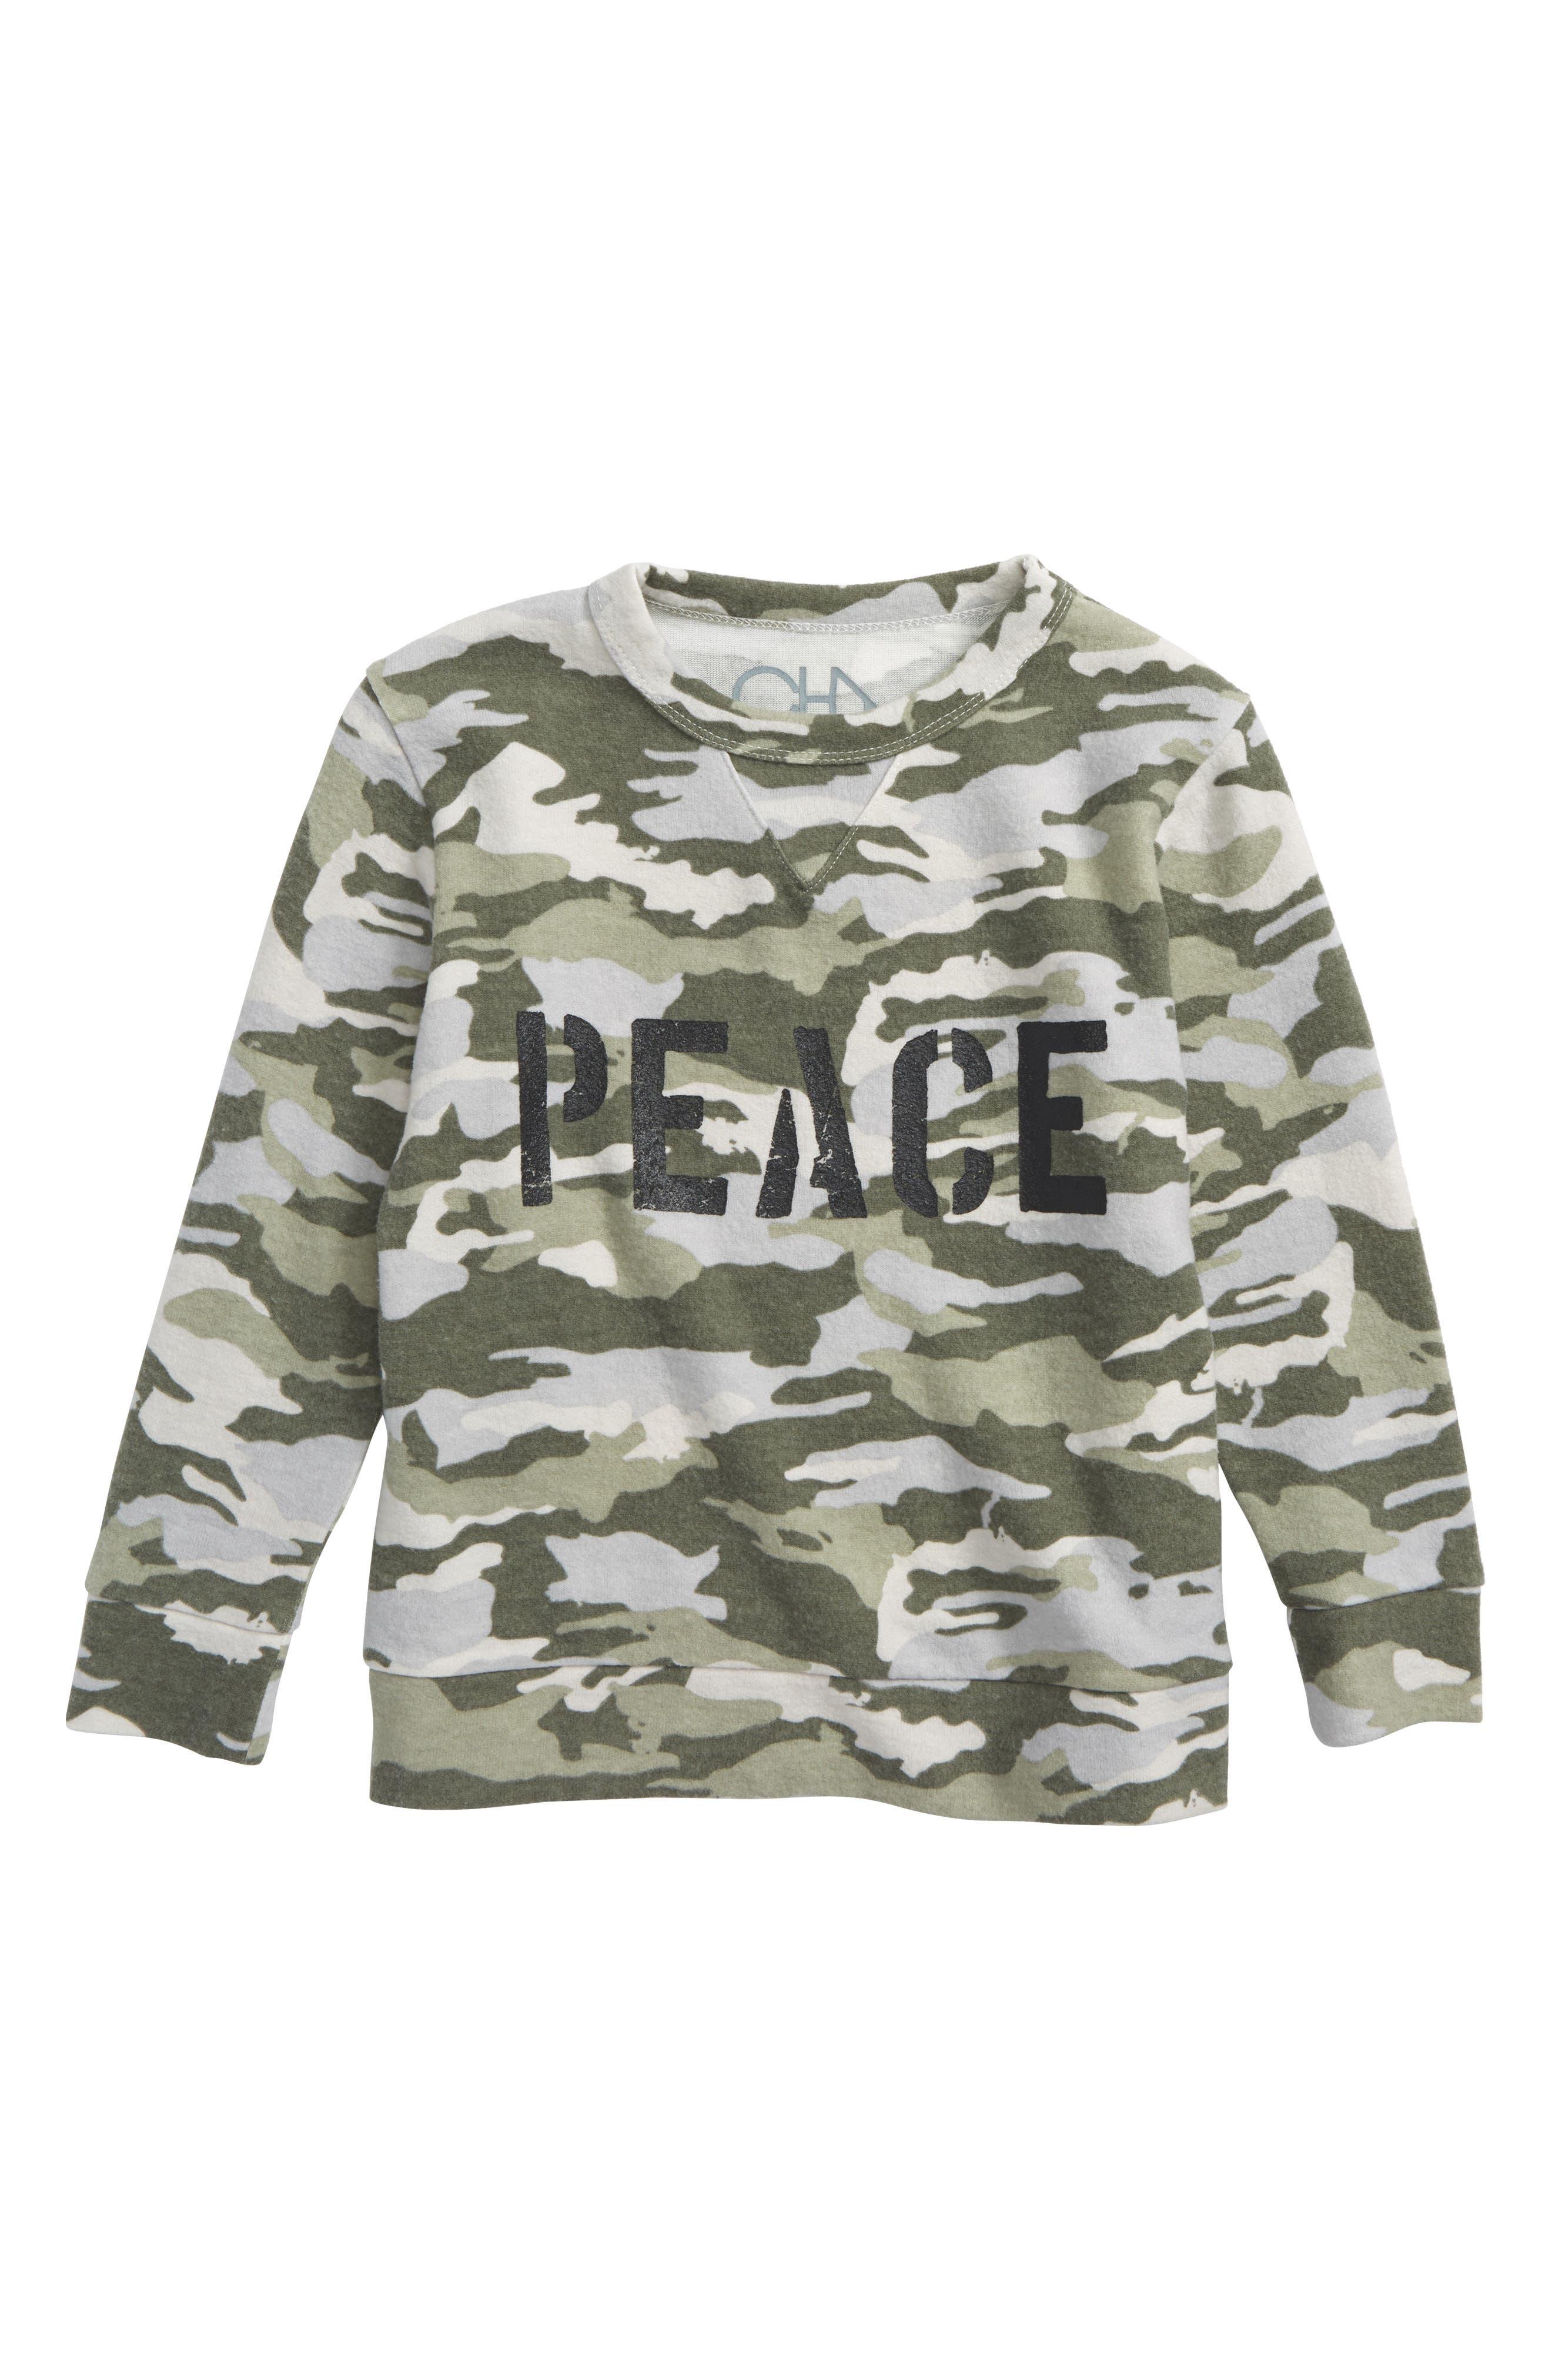 Main Image - Chaser Peace Camo Shirt (Toddler Boys, Little Boys & Big Boys)